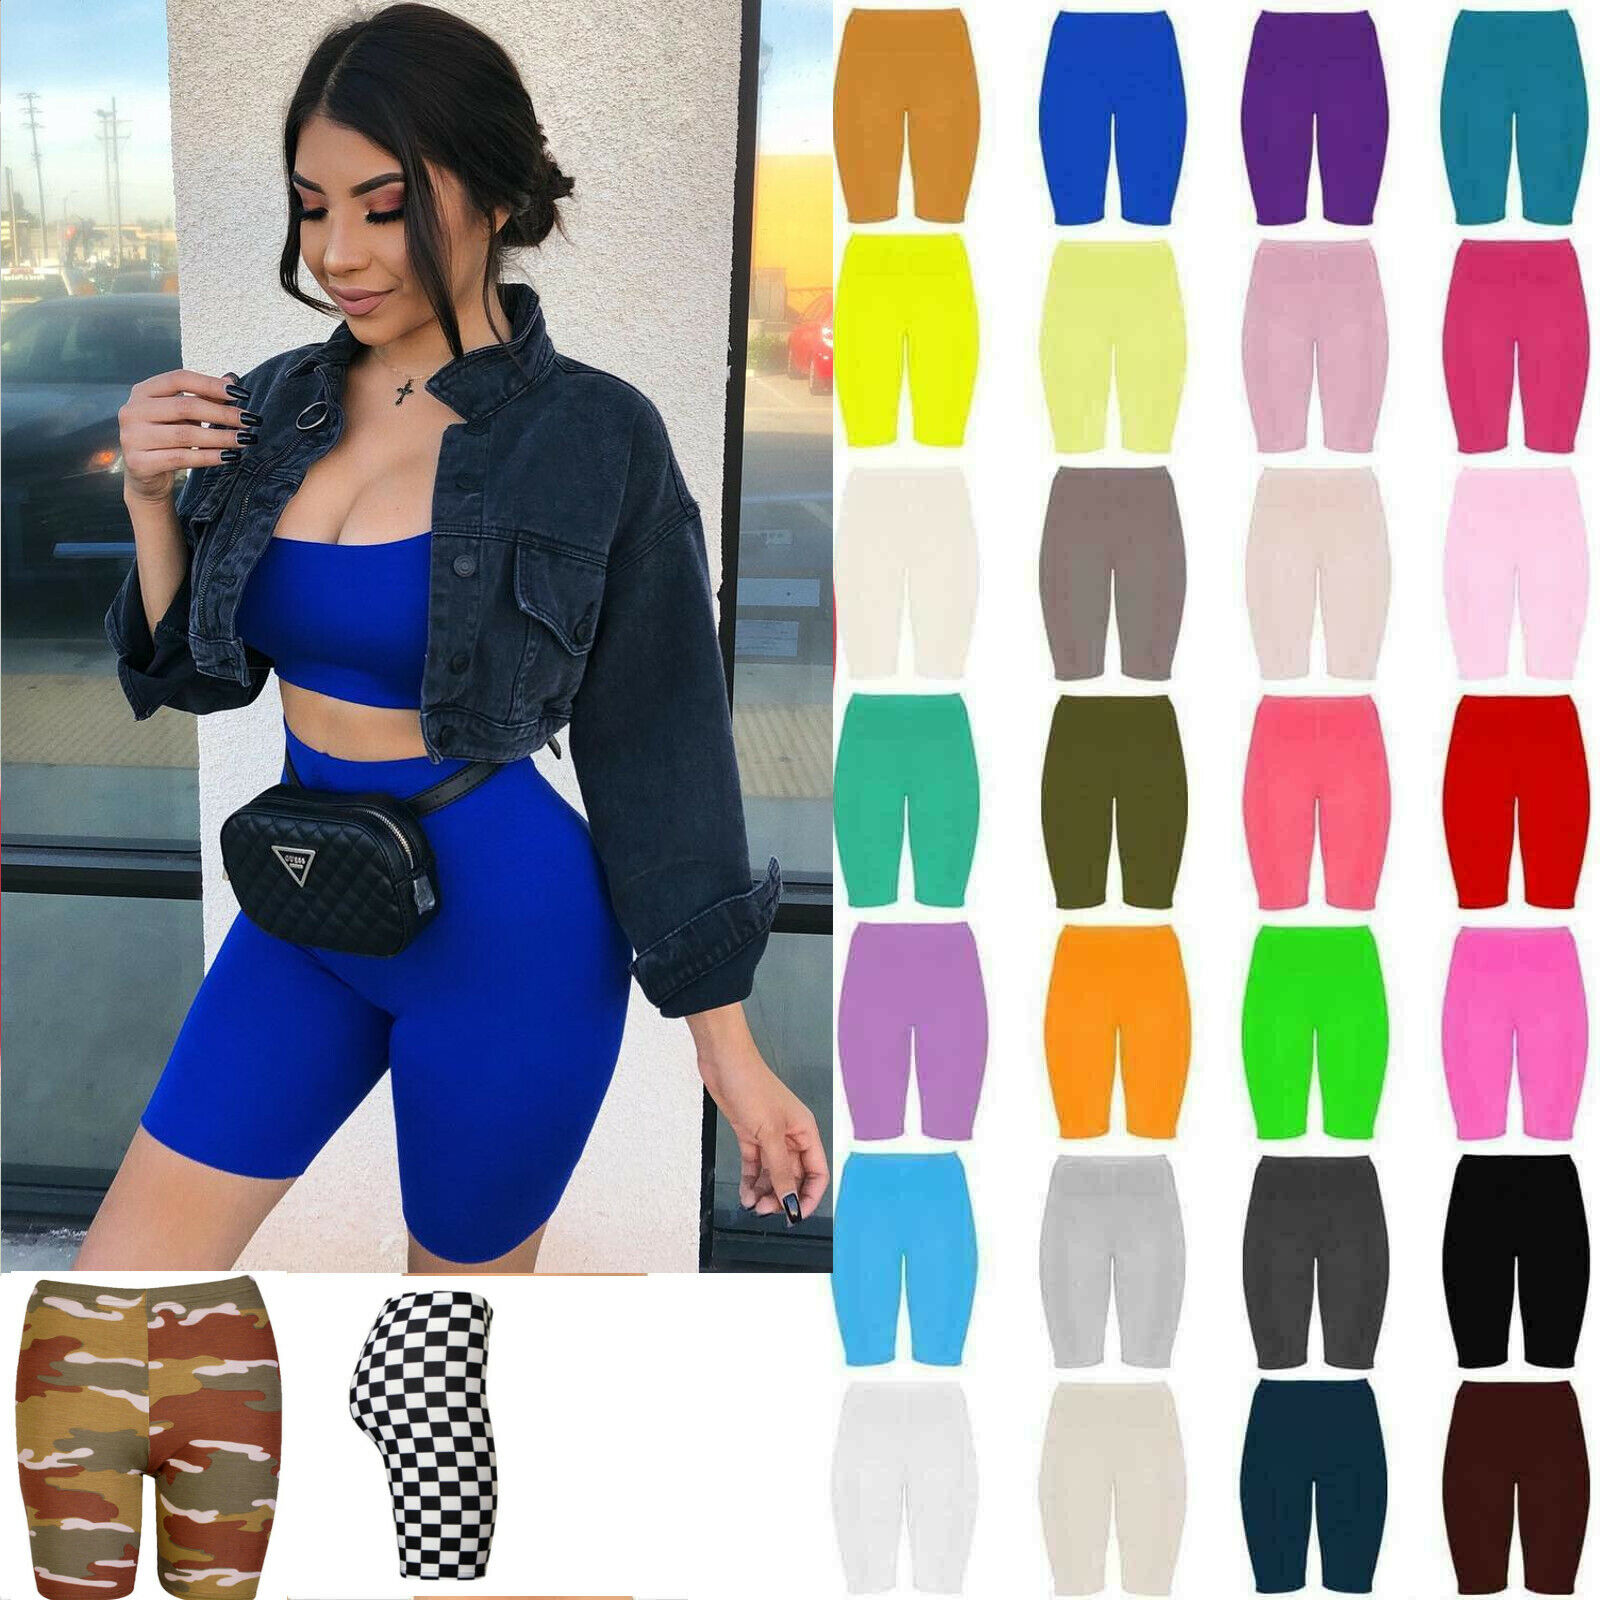 Womens Black Slinky Square Scoop Neck Crop Top Size 8 10 Bra bralette bikini